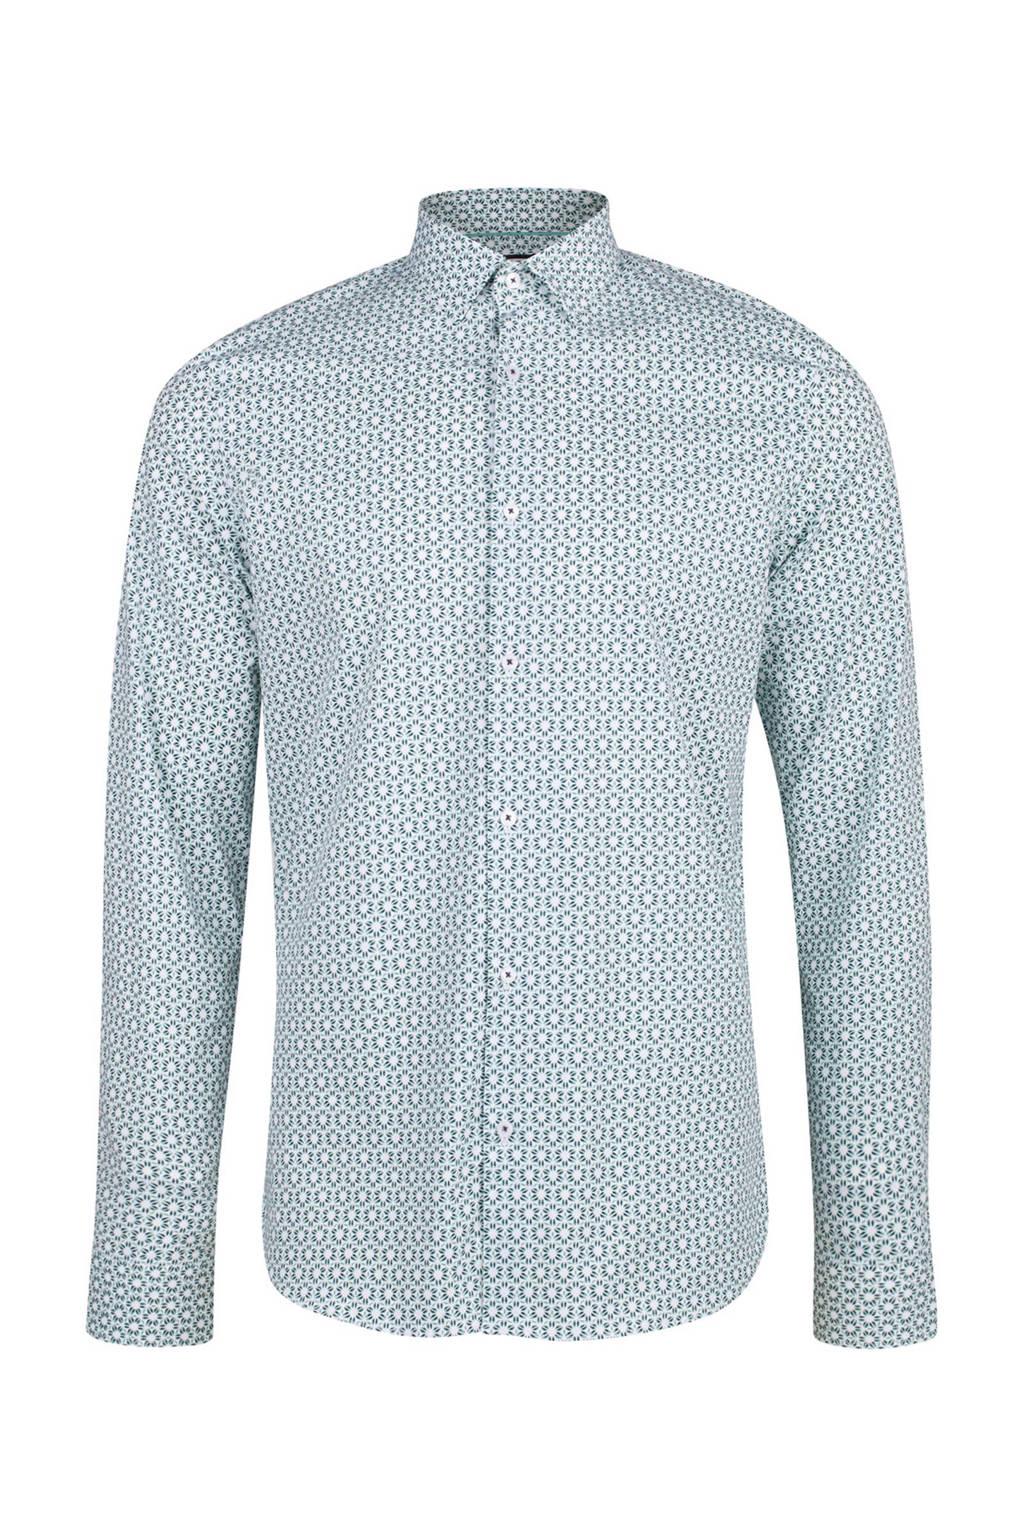 Overhemd Mintgroen.We Fashion Slim Fit Overhemd Mintgroen Wehkamp